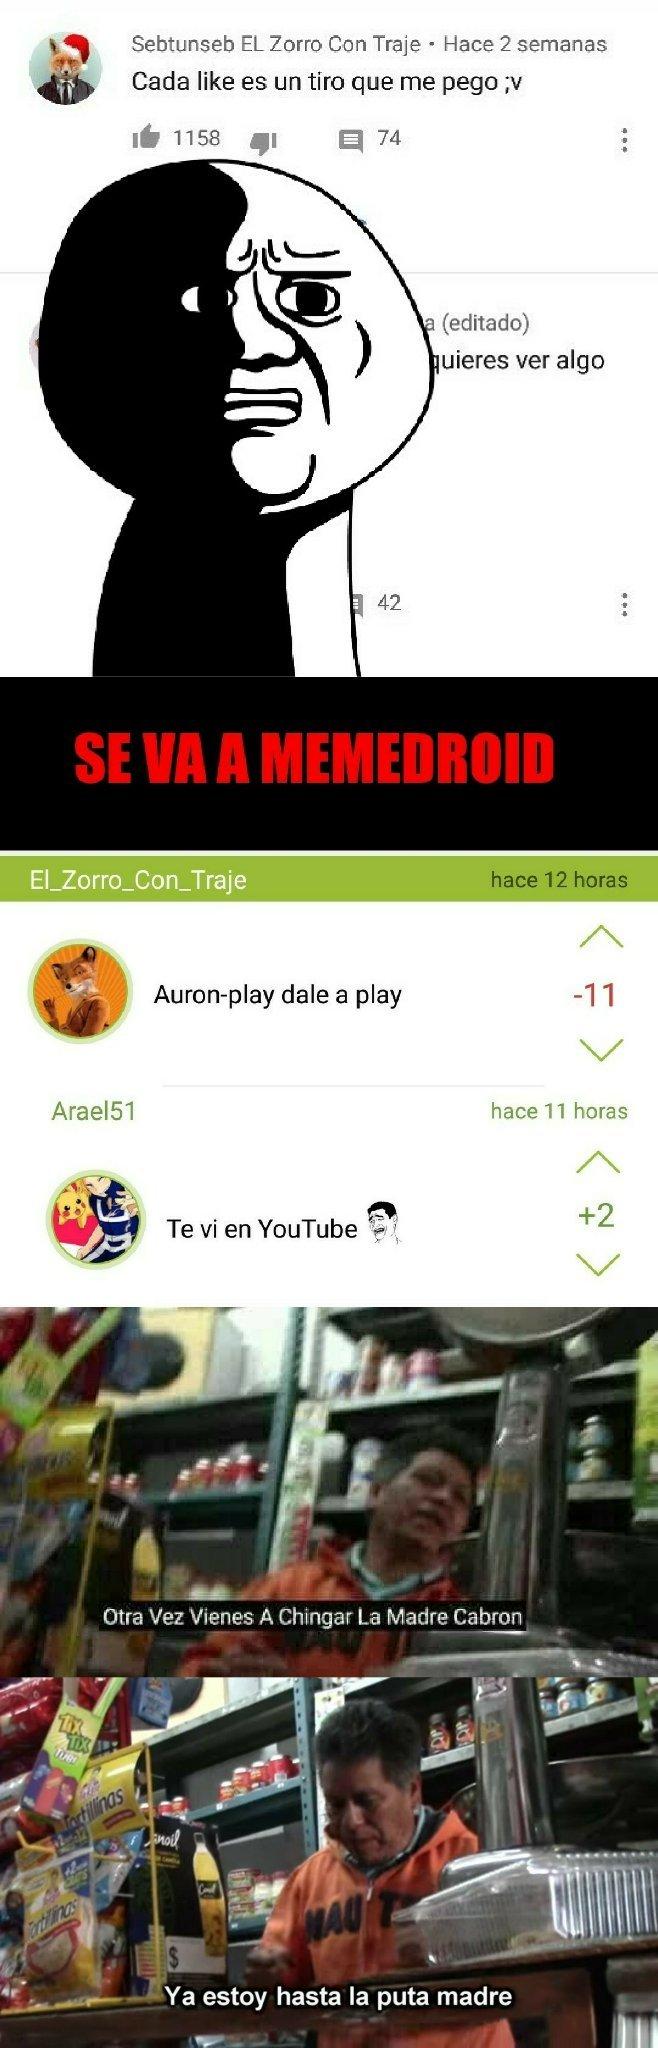 MUERTE A LOS FURROS - meme